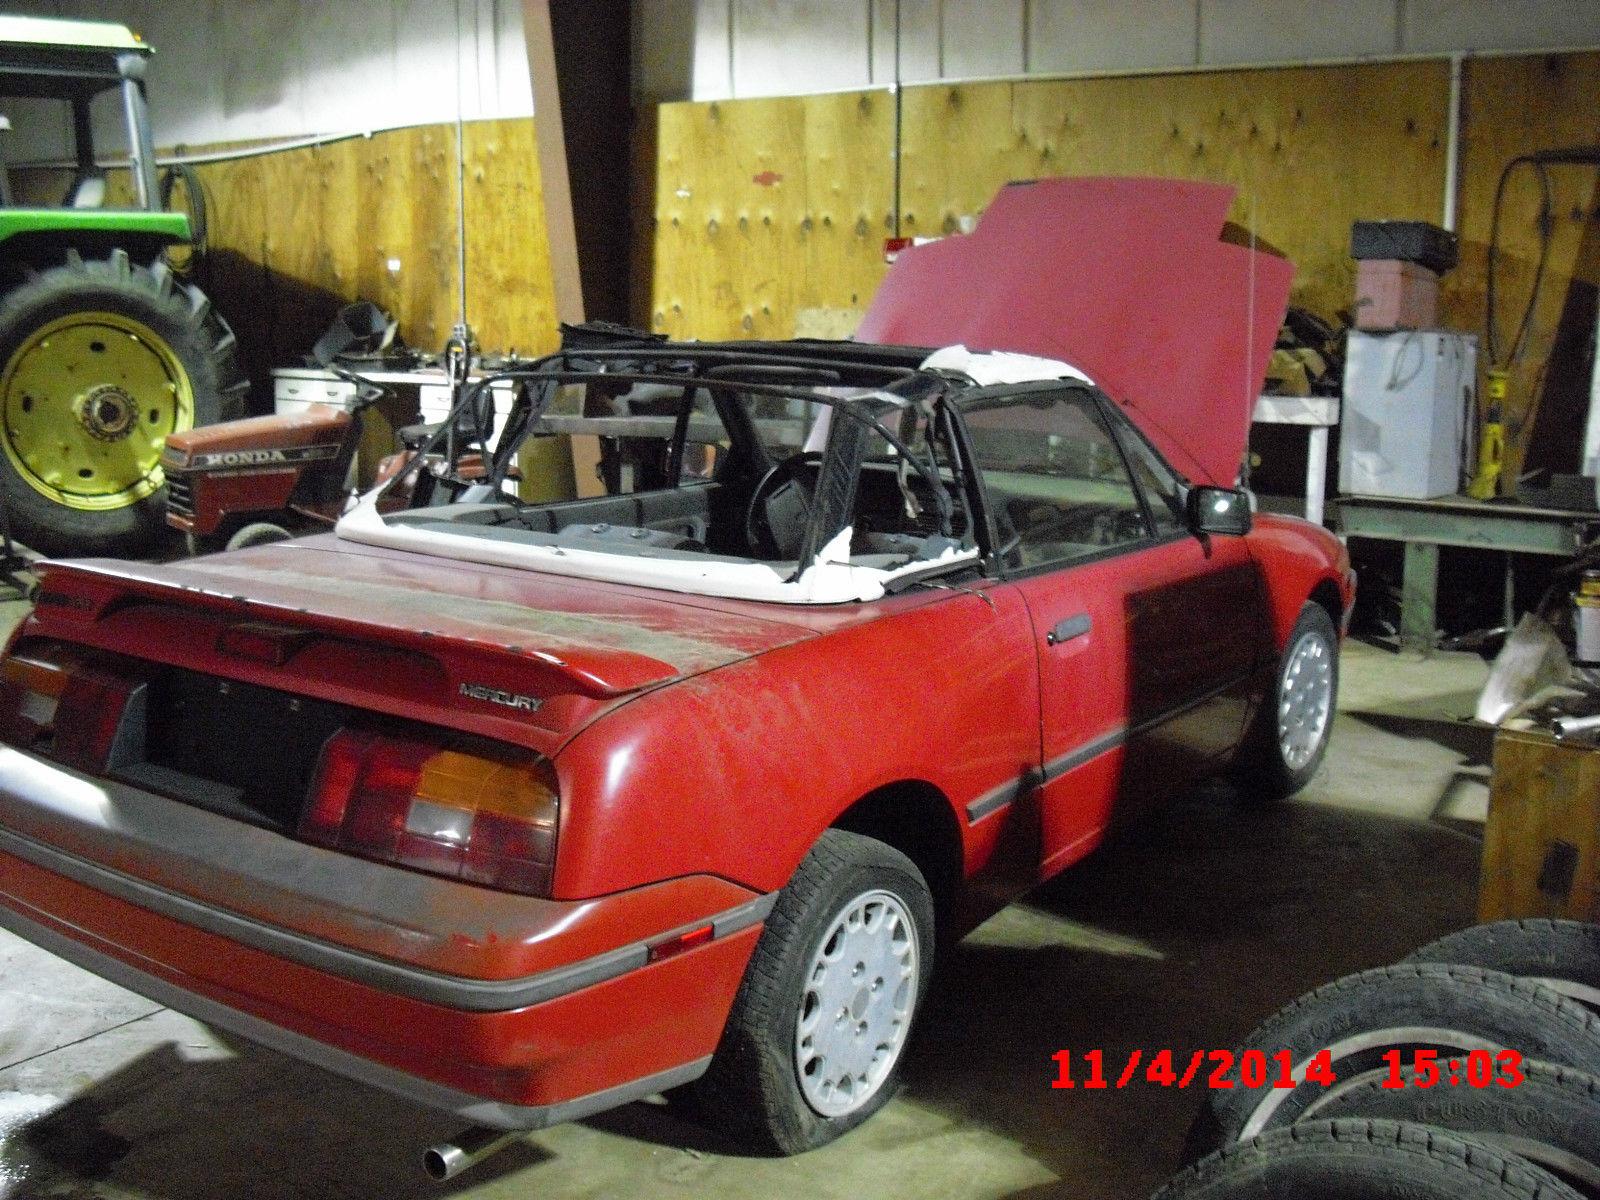 1991 Mercury Capri Parts Diagram Trusted Schematics 1993 Fuse Box Xr2 Convertible 2 Door 1 6l For Sale In Santa Fe